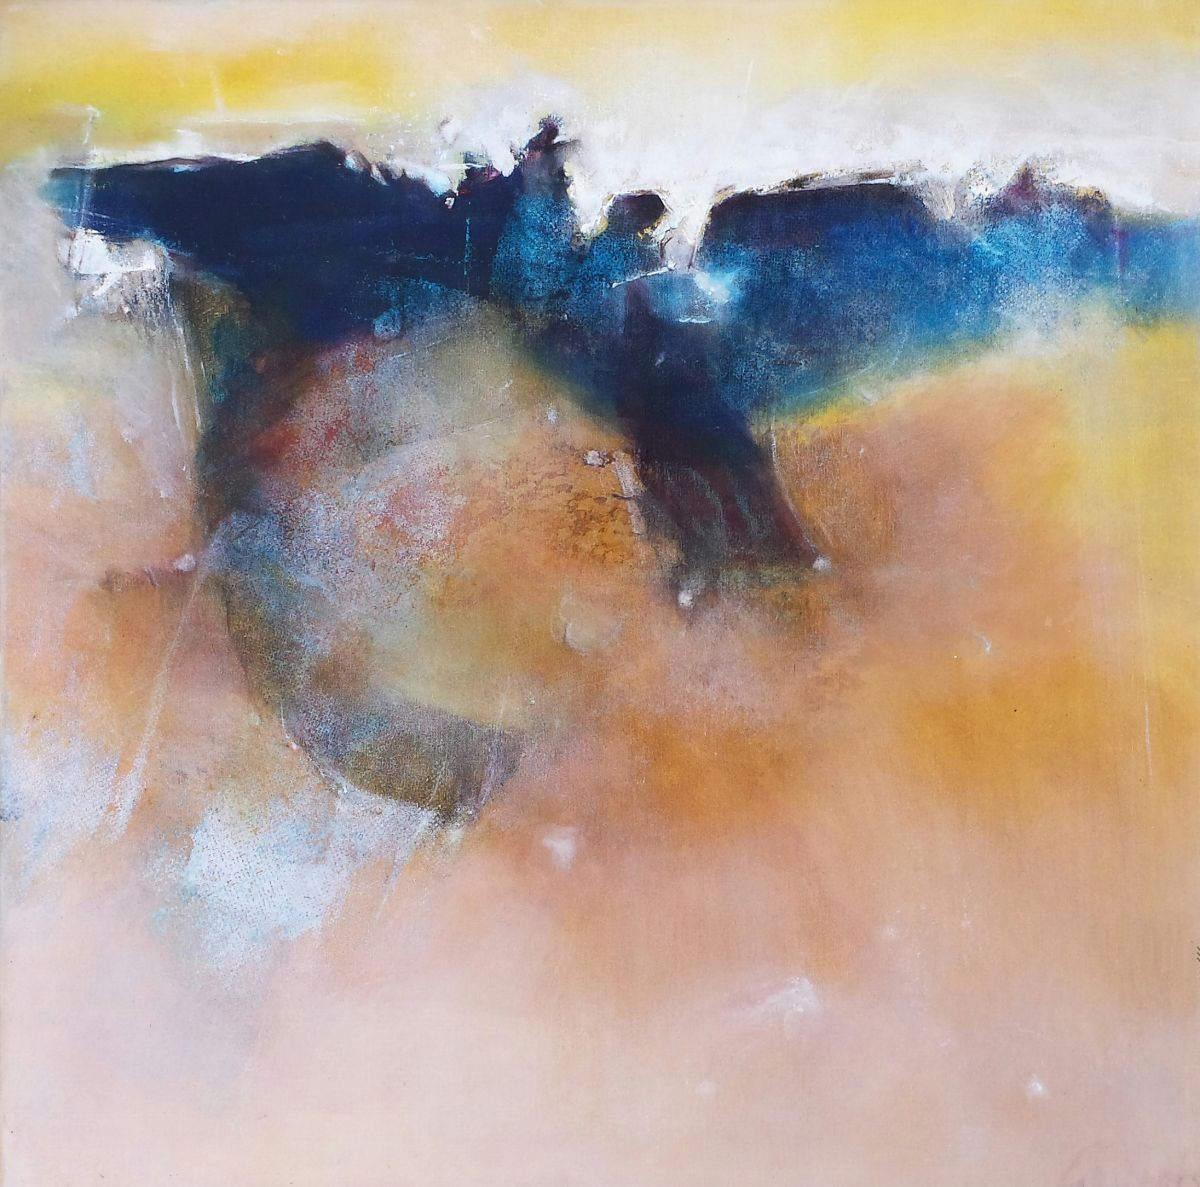 Kunst: l'oeil attentative van kunstenaar Sietse Goverts